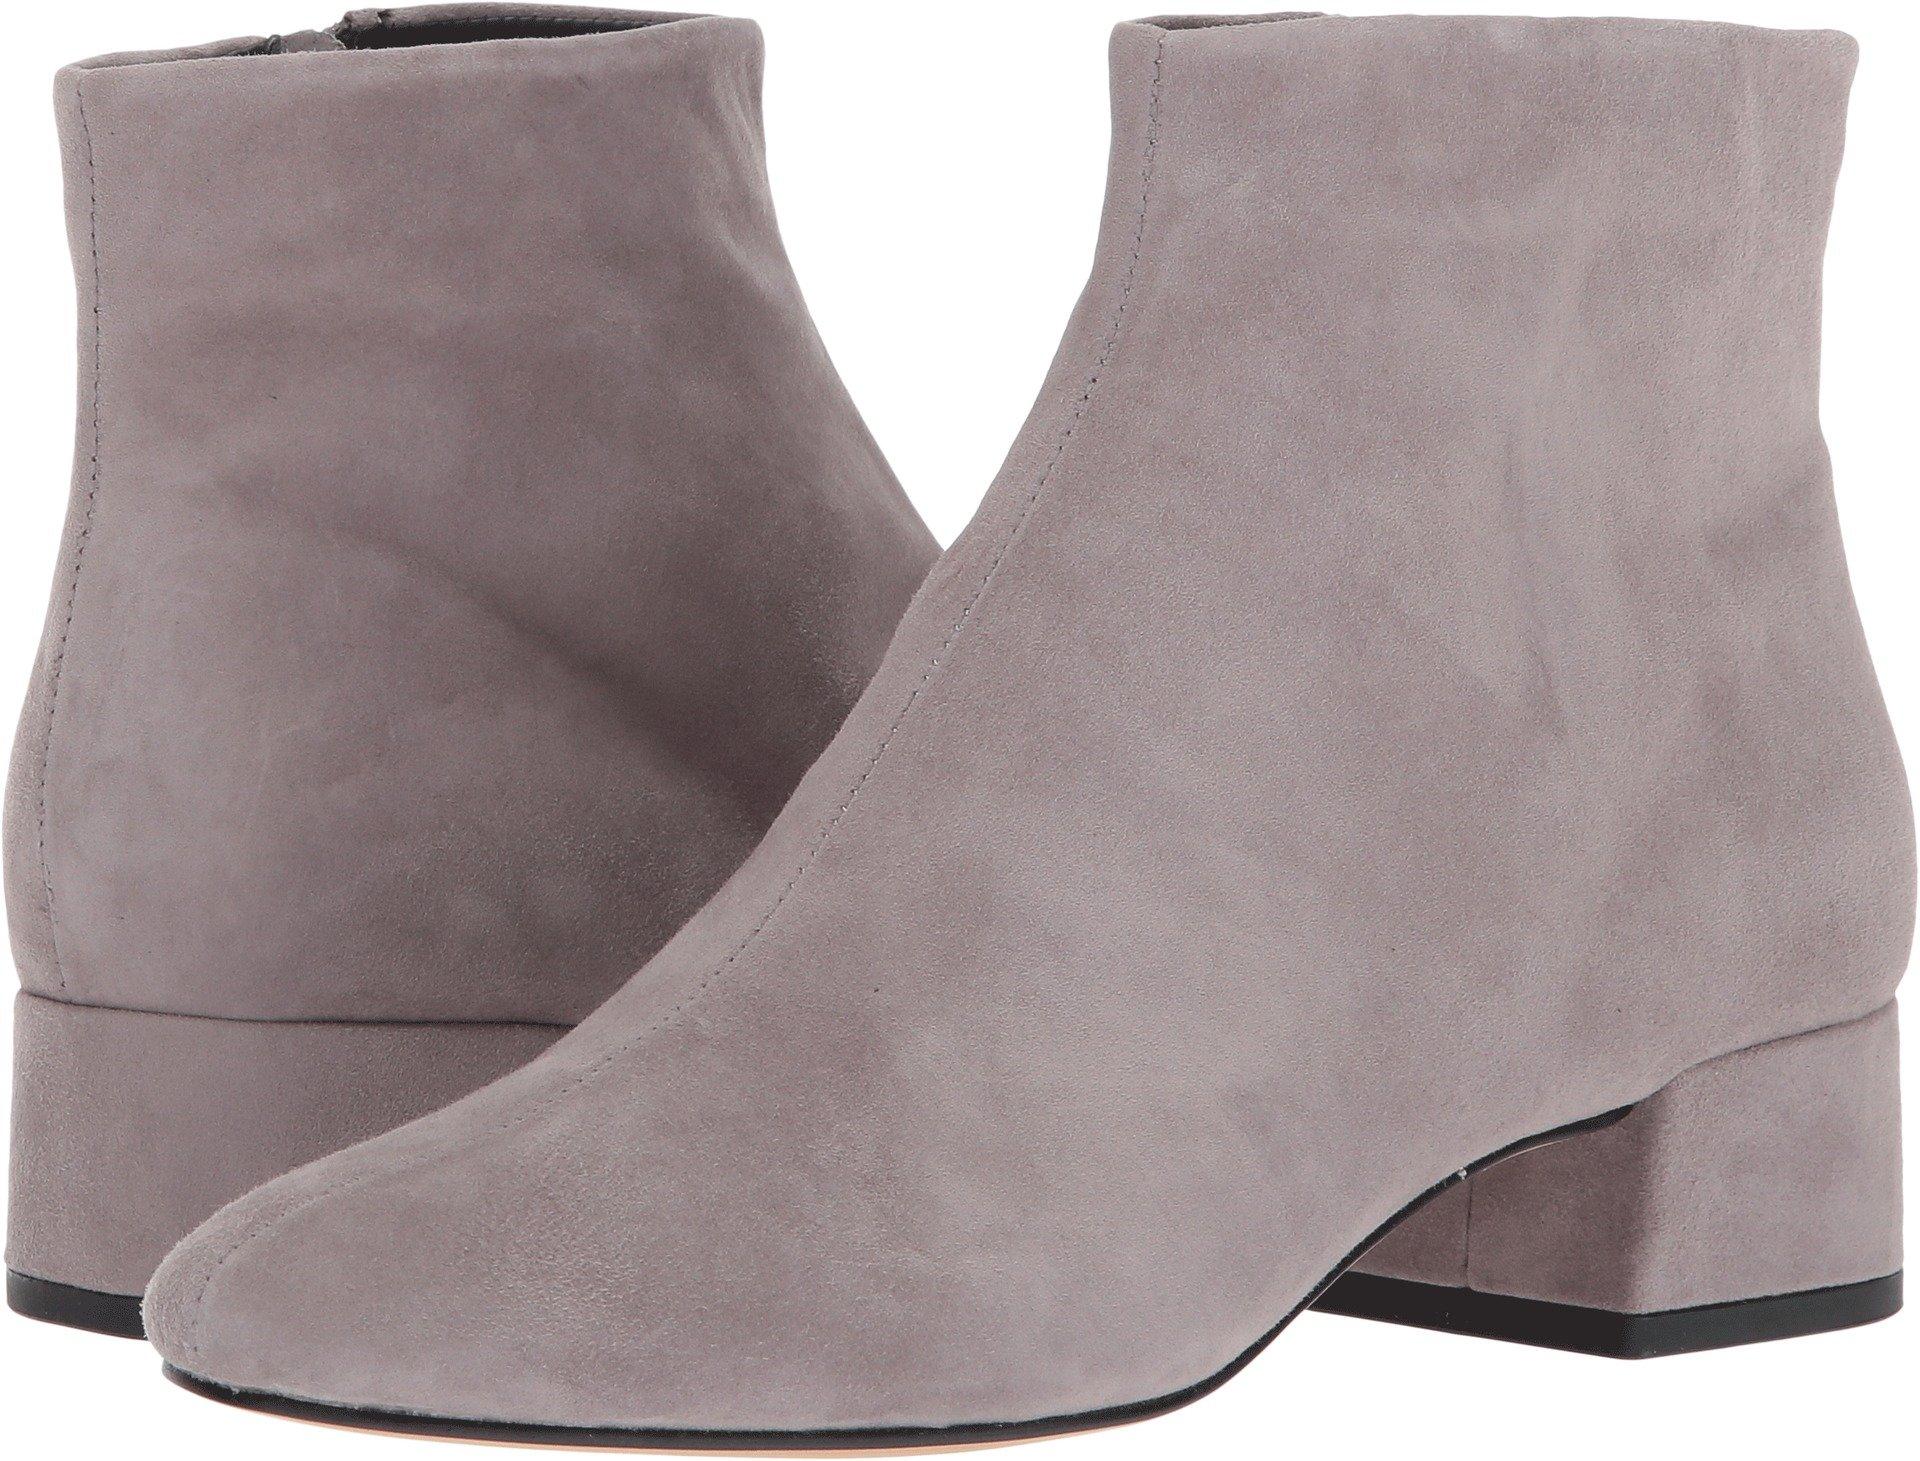 Dolce Vita Women's Jac Ankle Boot, Smoke Suede, 8.5 Medium US